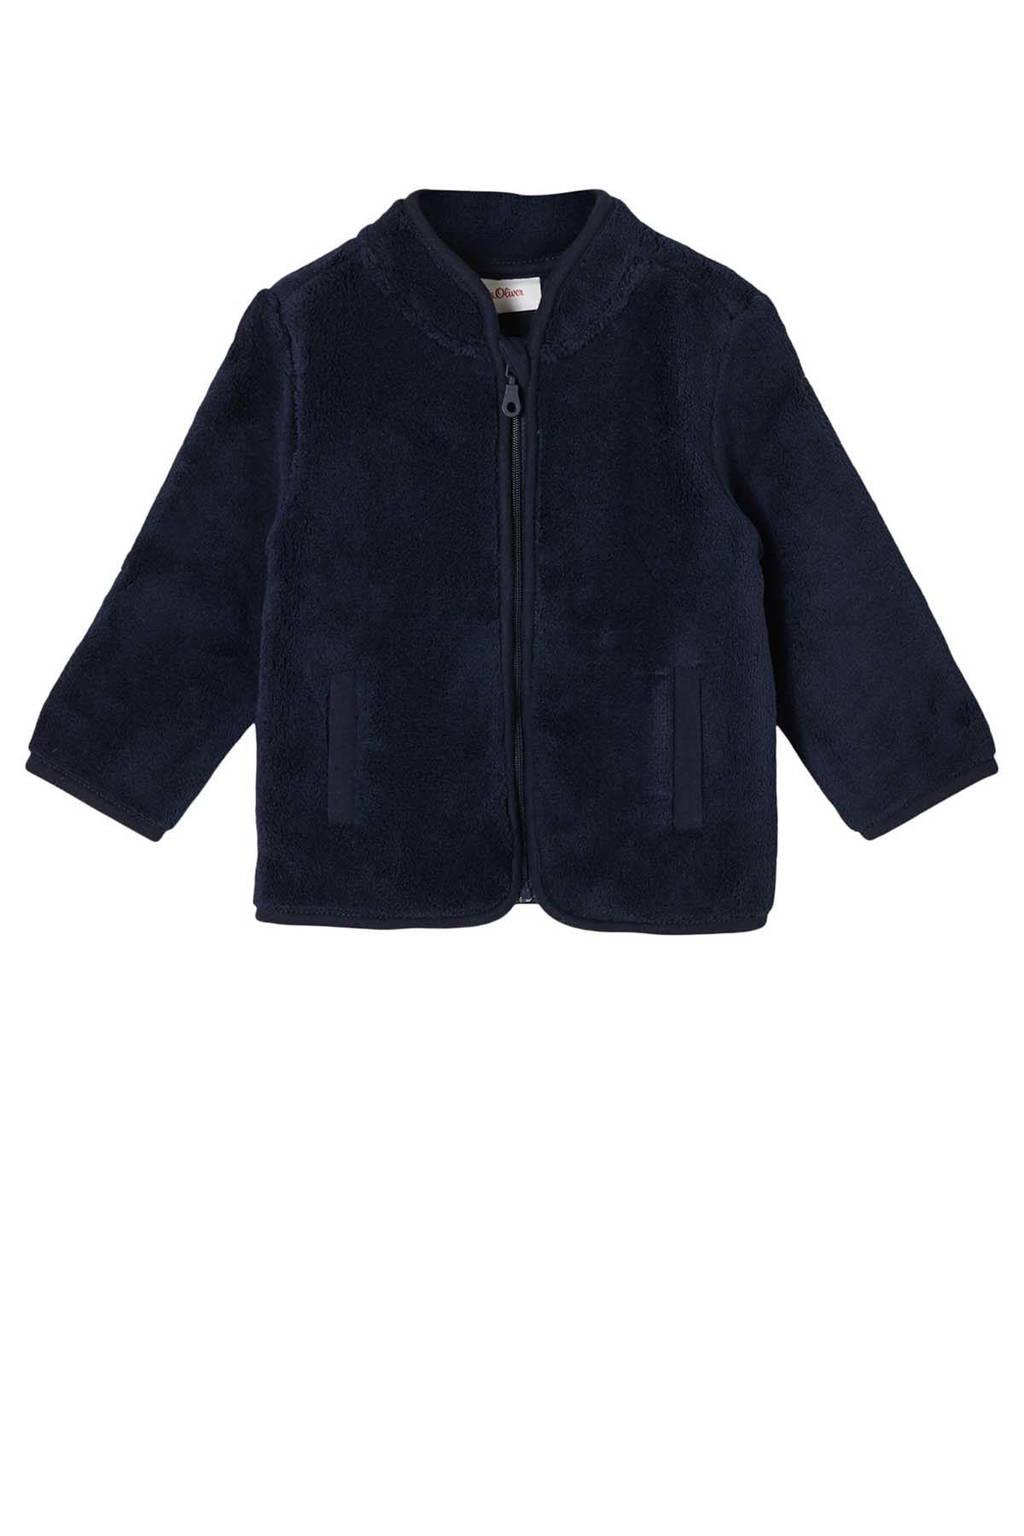 s.Oliver baby fleece vest donkerblauw, Donkerblauw